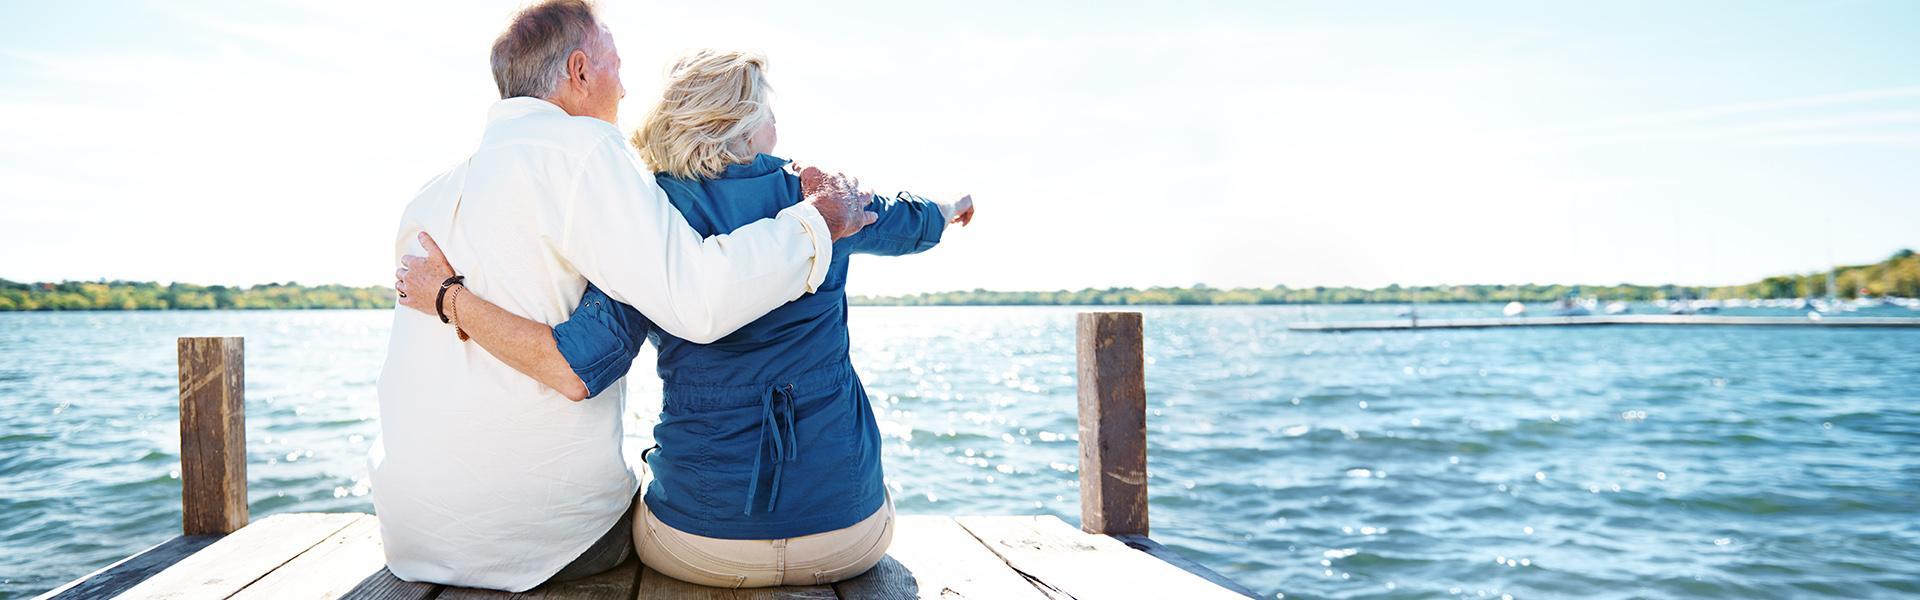 Elderly couple on a pier